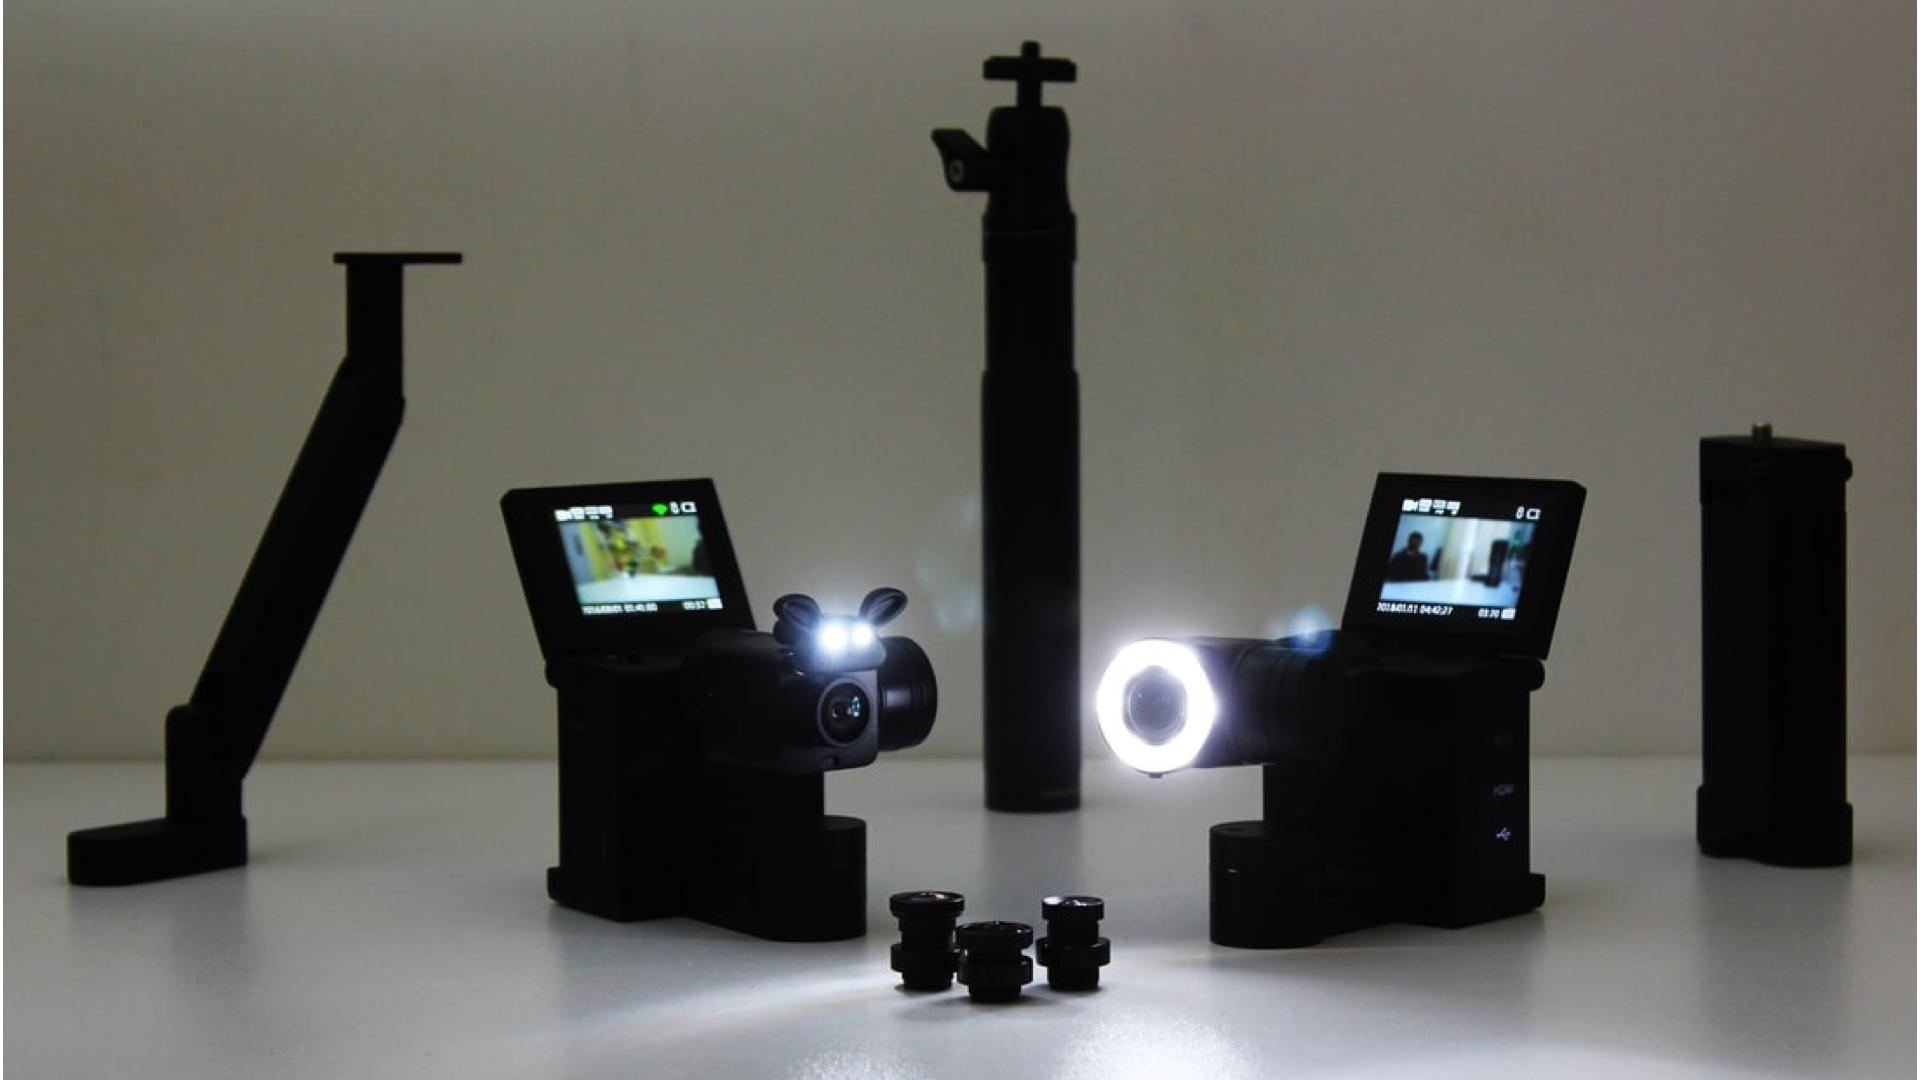 IdolcamがKickstarterに登場 - ジンバル搭載でレンズ交換できる4Kアクションカメラ